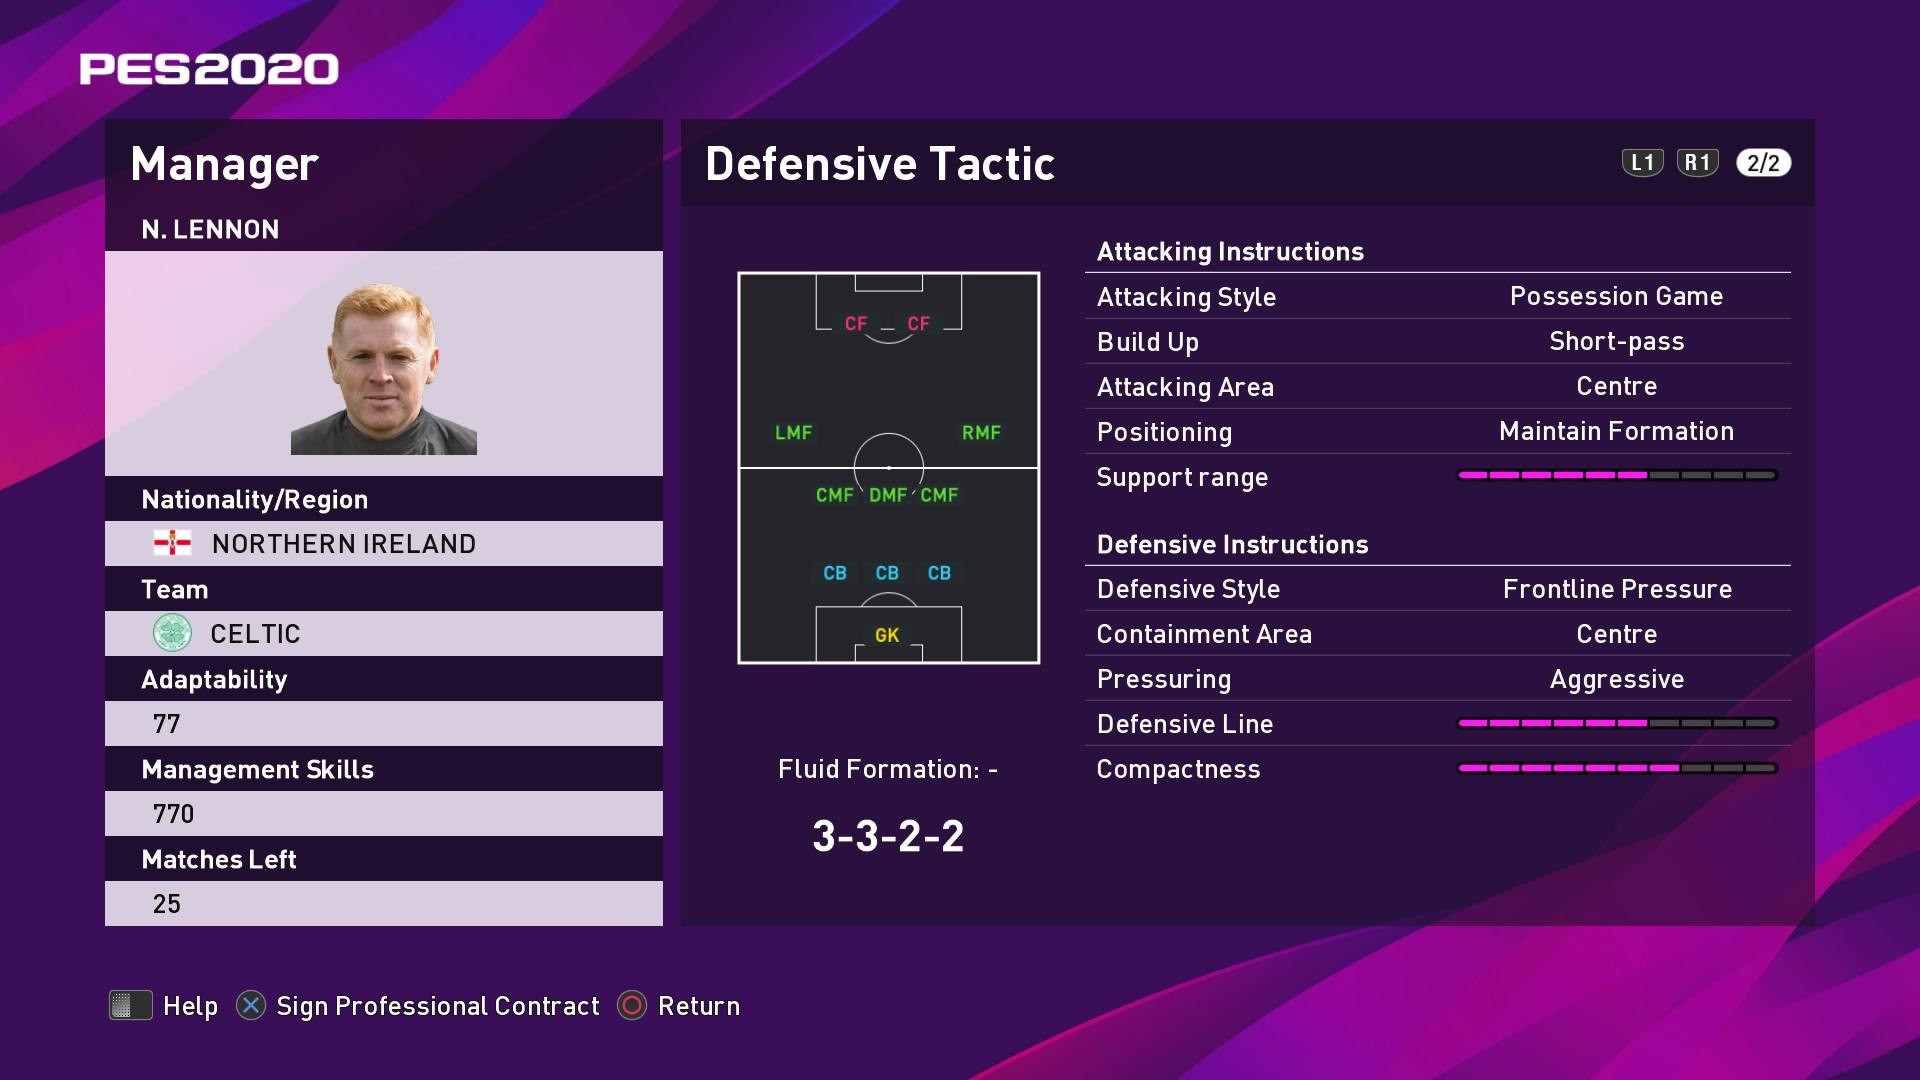 N. Lennon (2) (Neil Lennon) Defensive Tactic in PES 2020 myClub